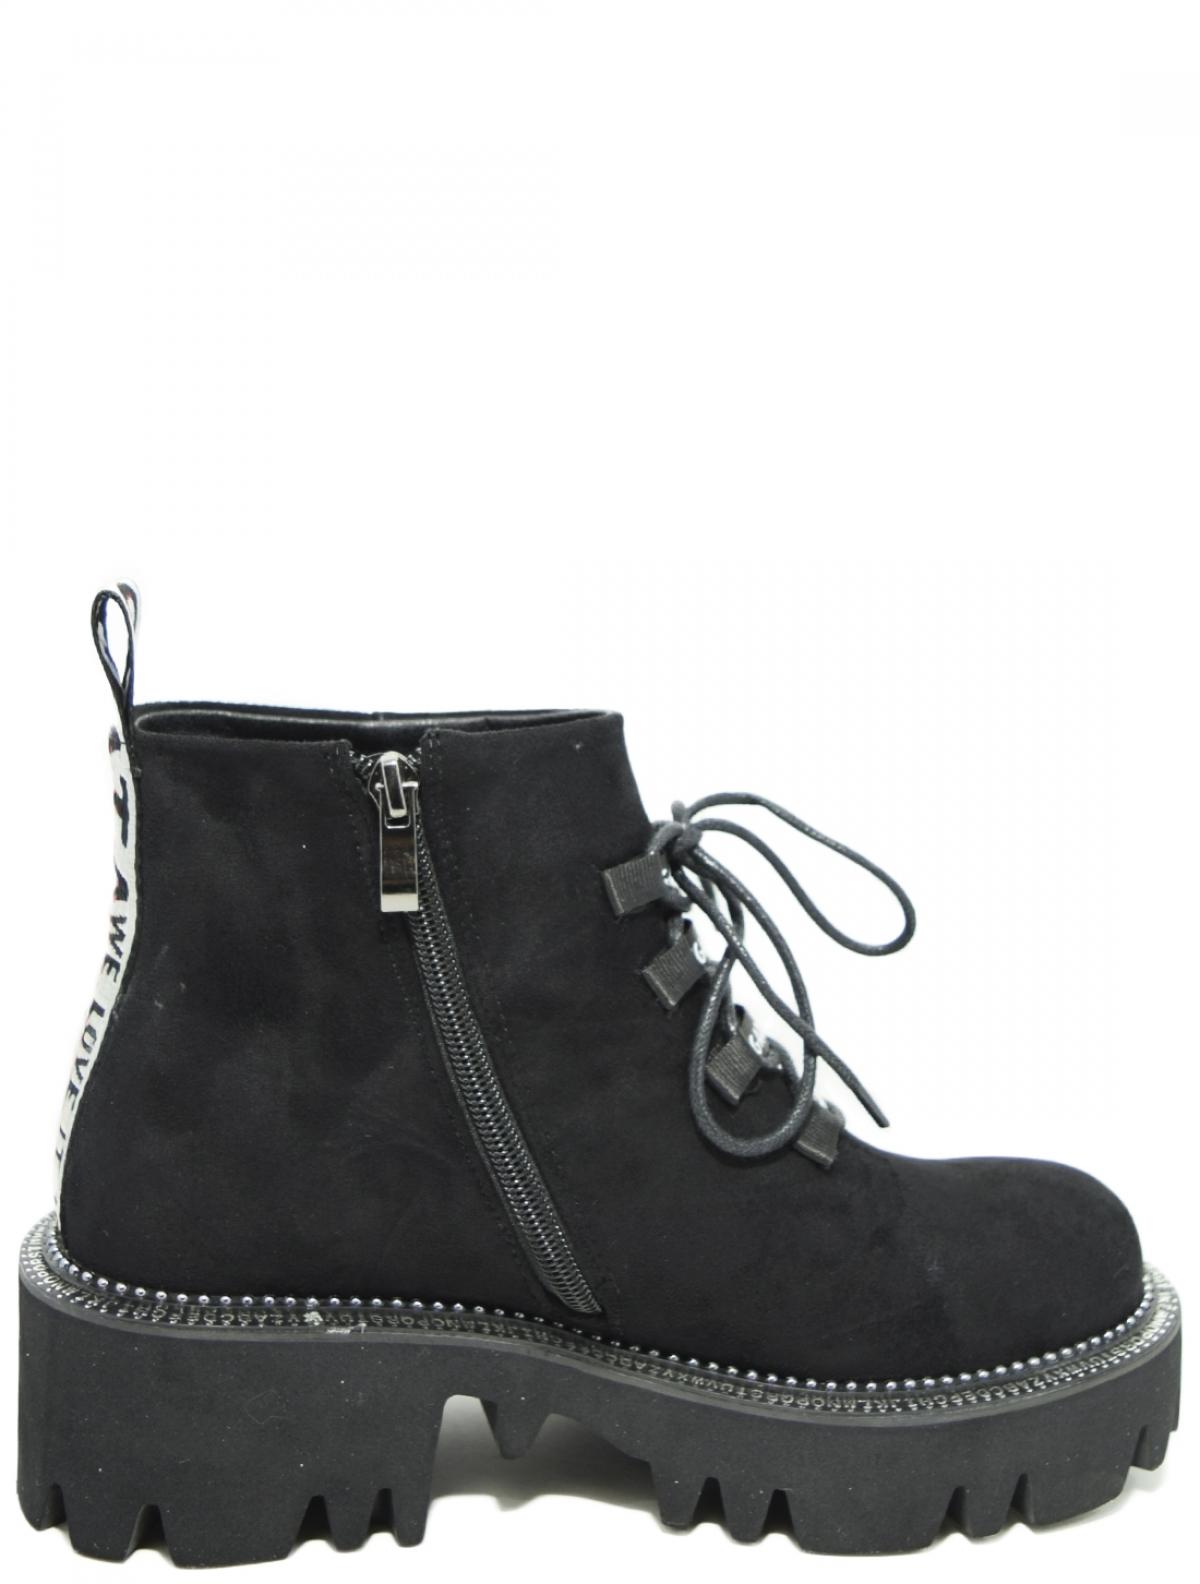 Admlis H901 женские ботинки